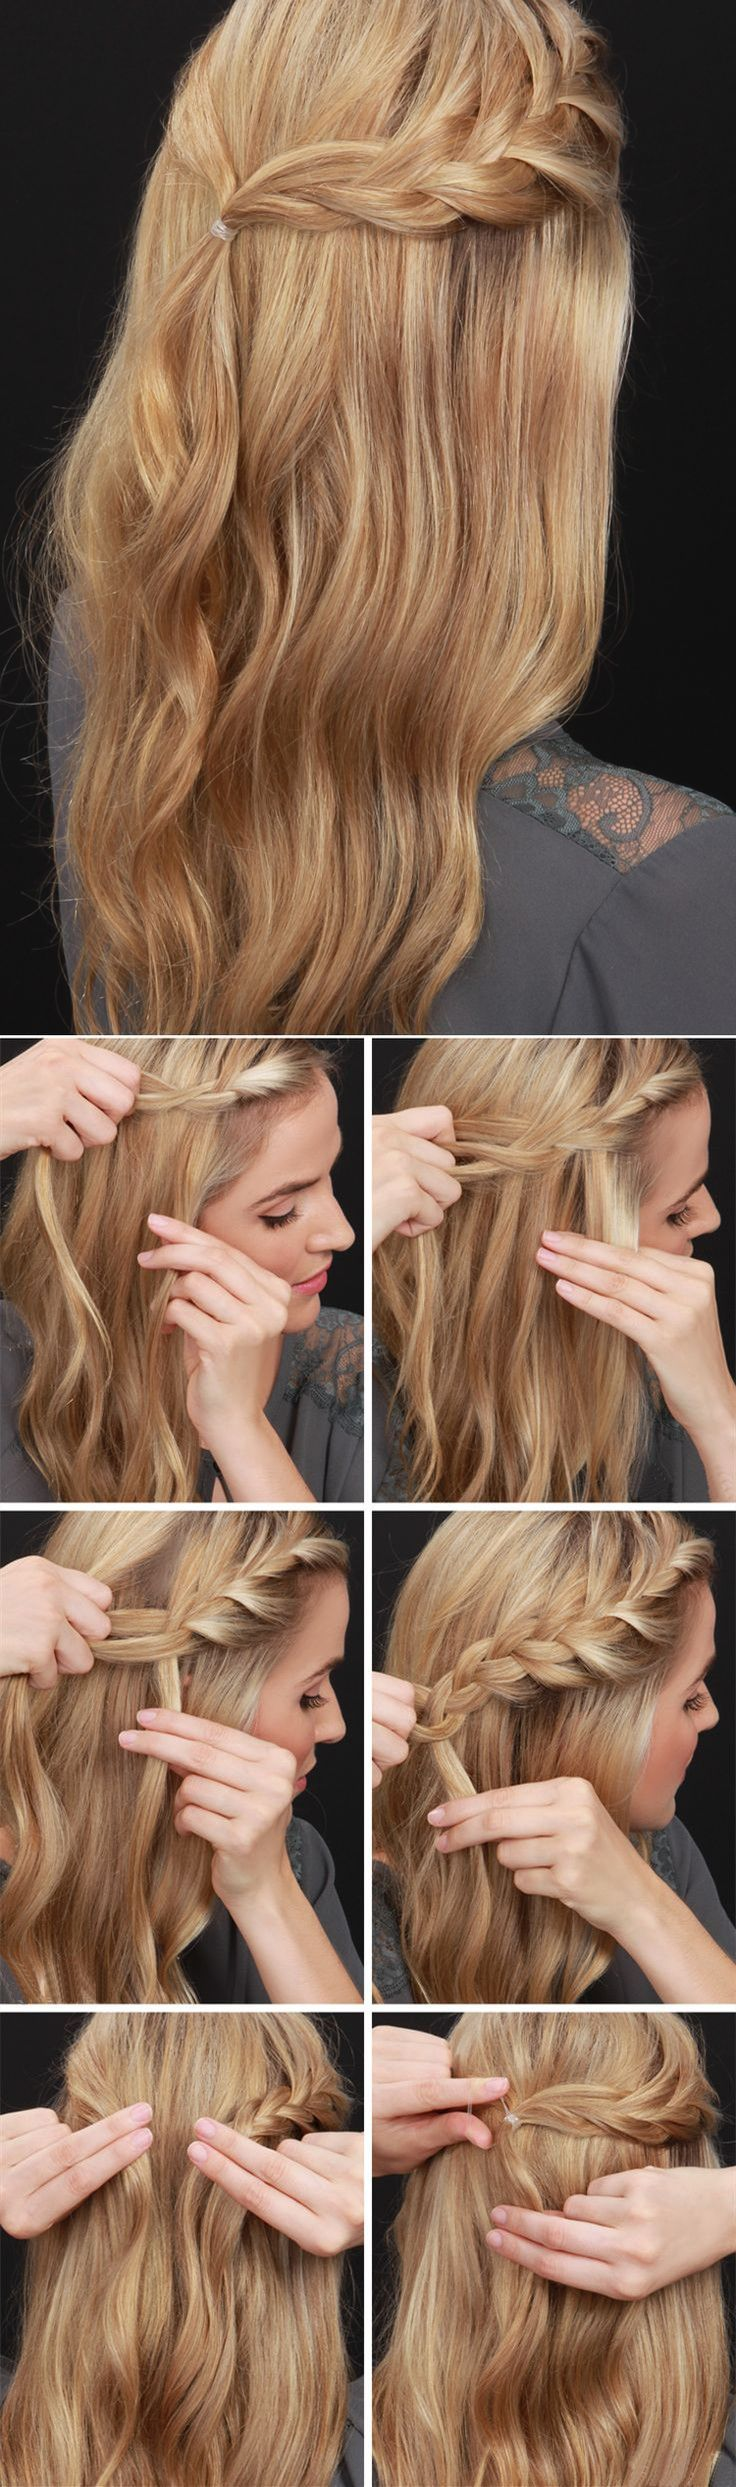 best cabelos images on pinterest hair makeup bridal hairstyles